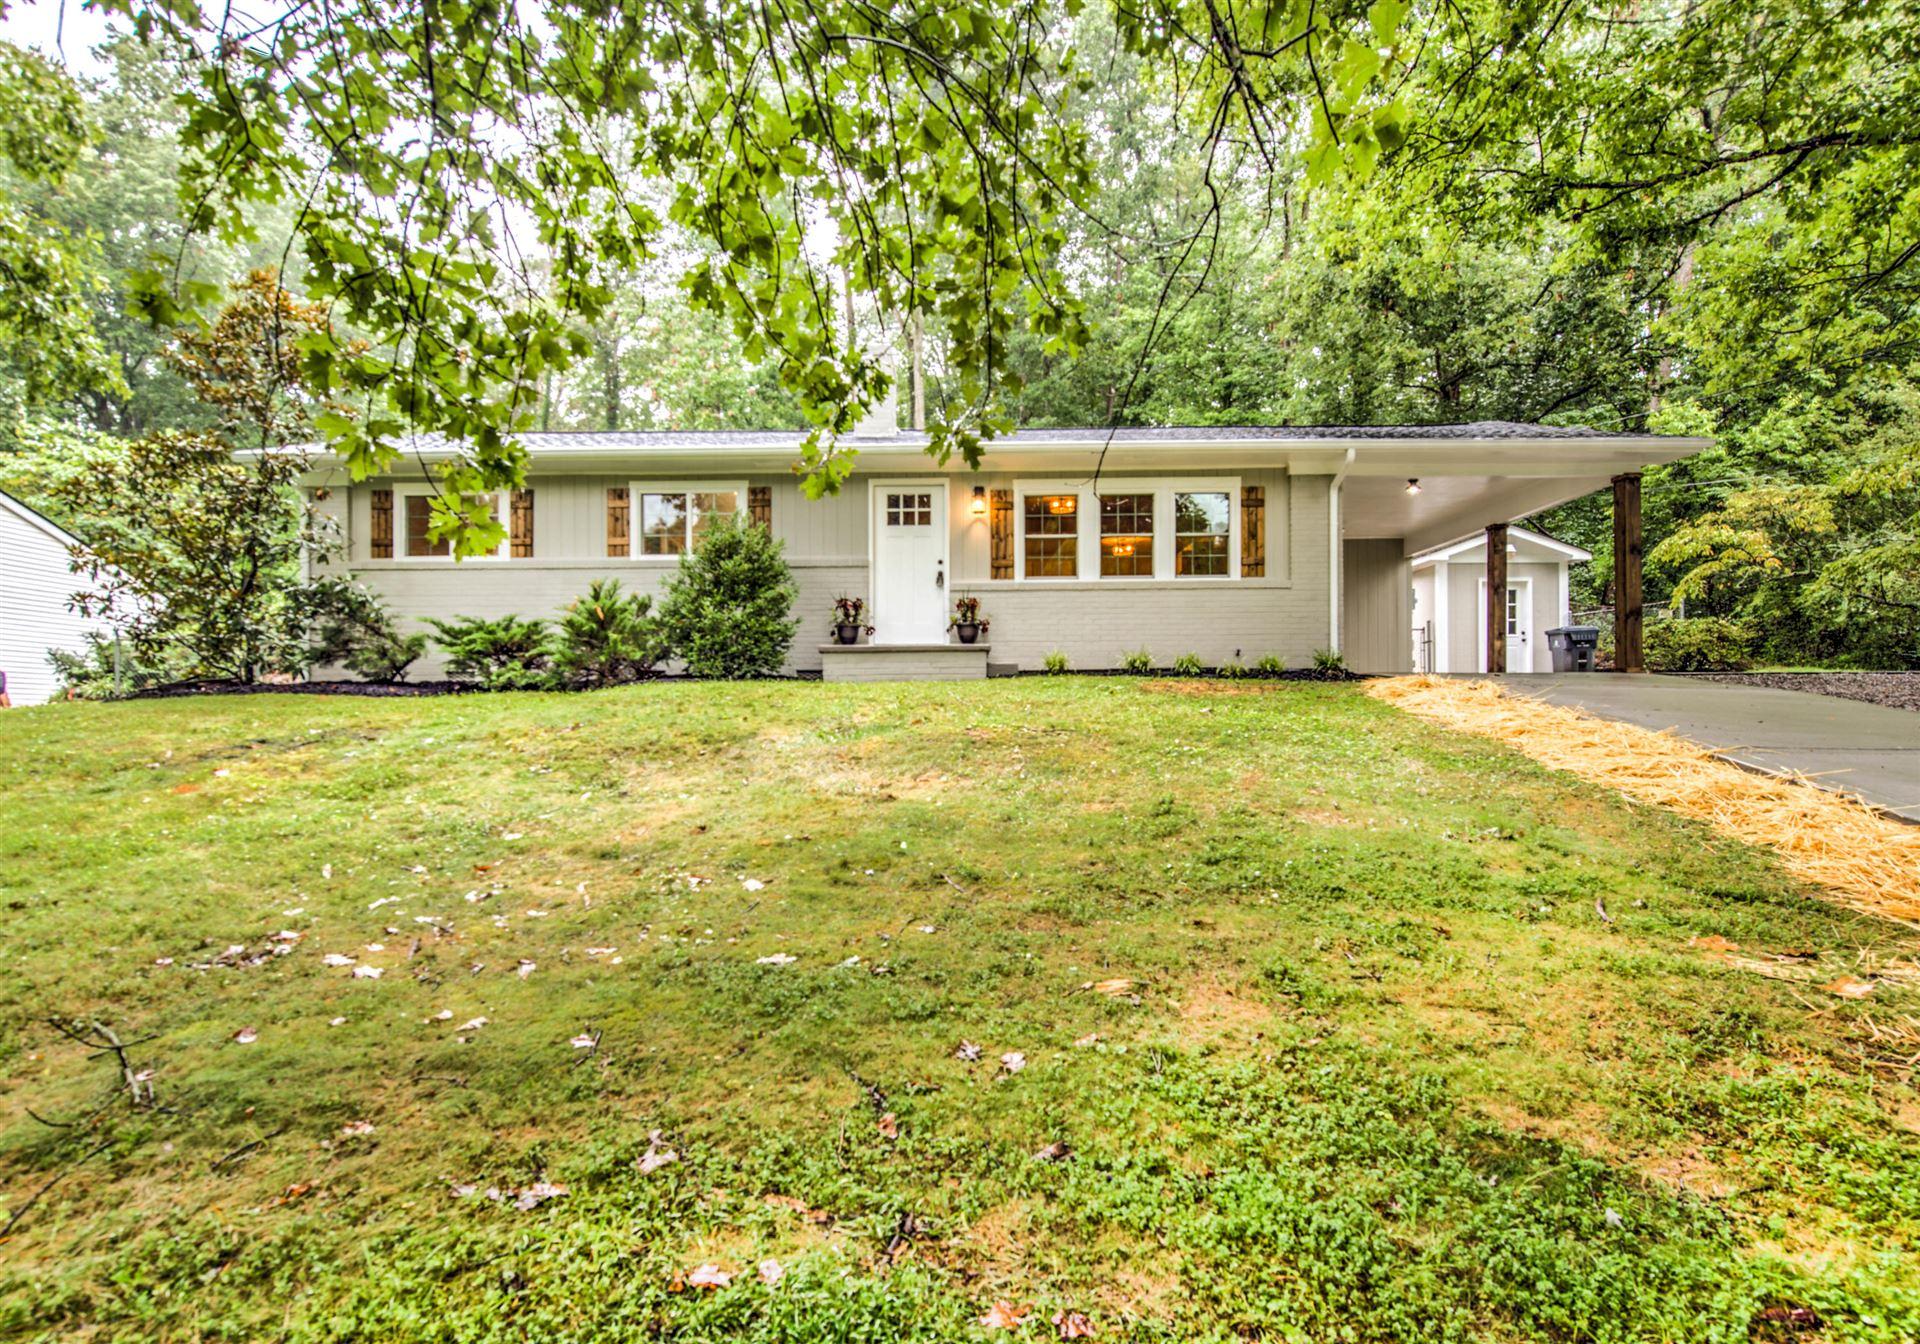 Photo of 4503 Barbara Drive, Knoxville, TN 37918 (MLS # 1164529)